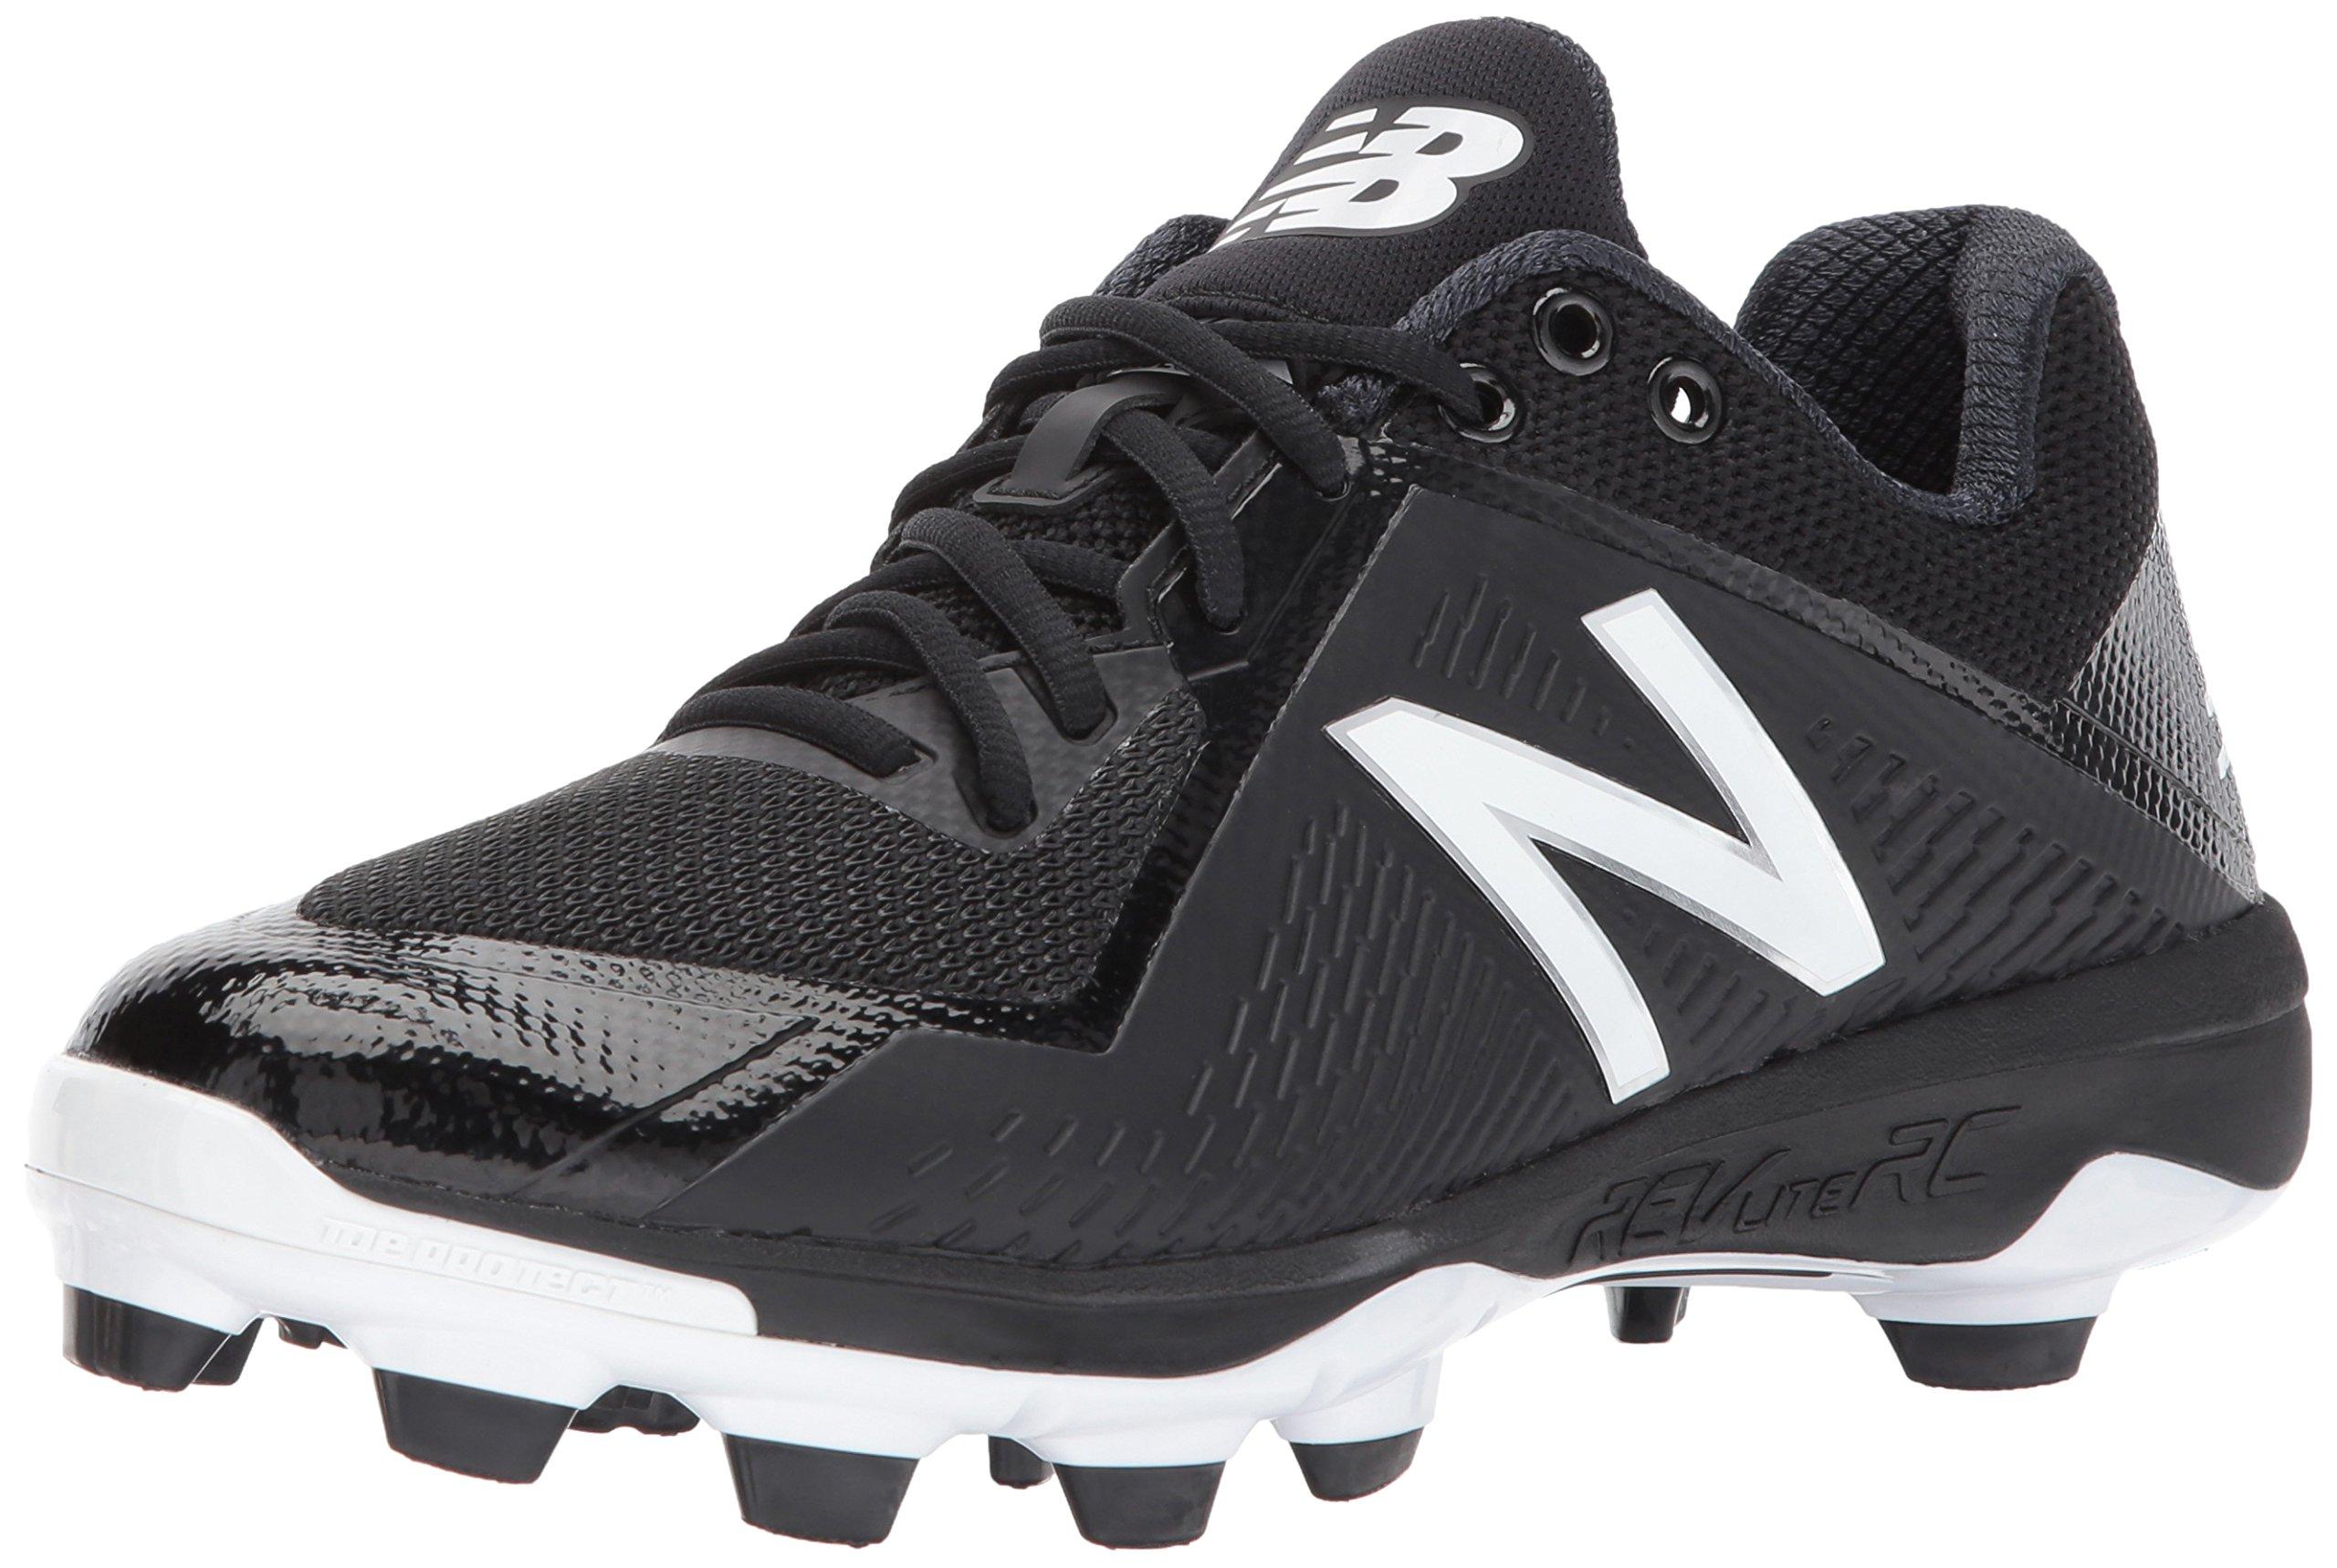 New Balance Men's PL4040v4 Molded Baseball Shoe, Black/White, 8 D US by New Balance